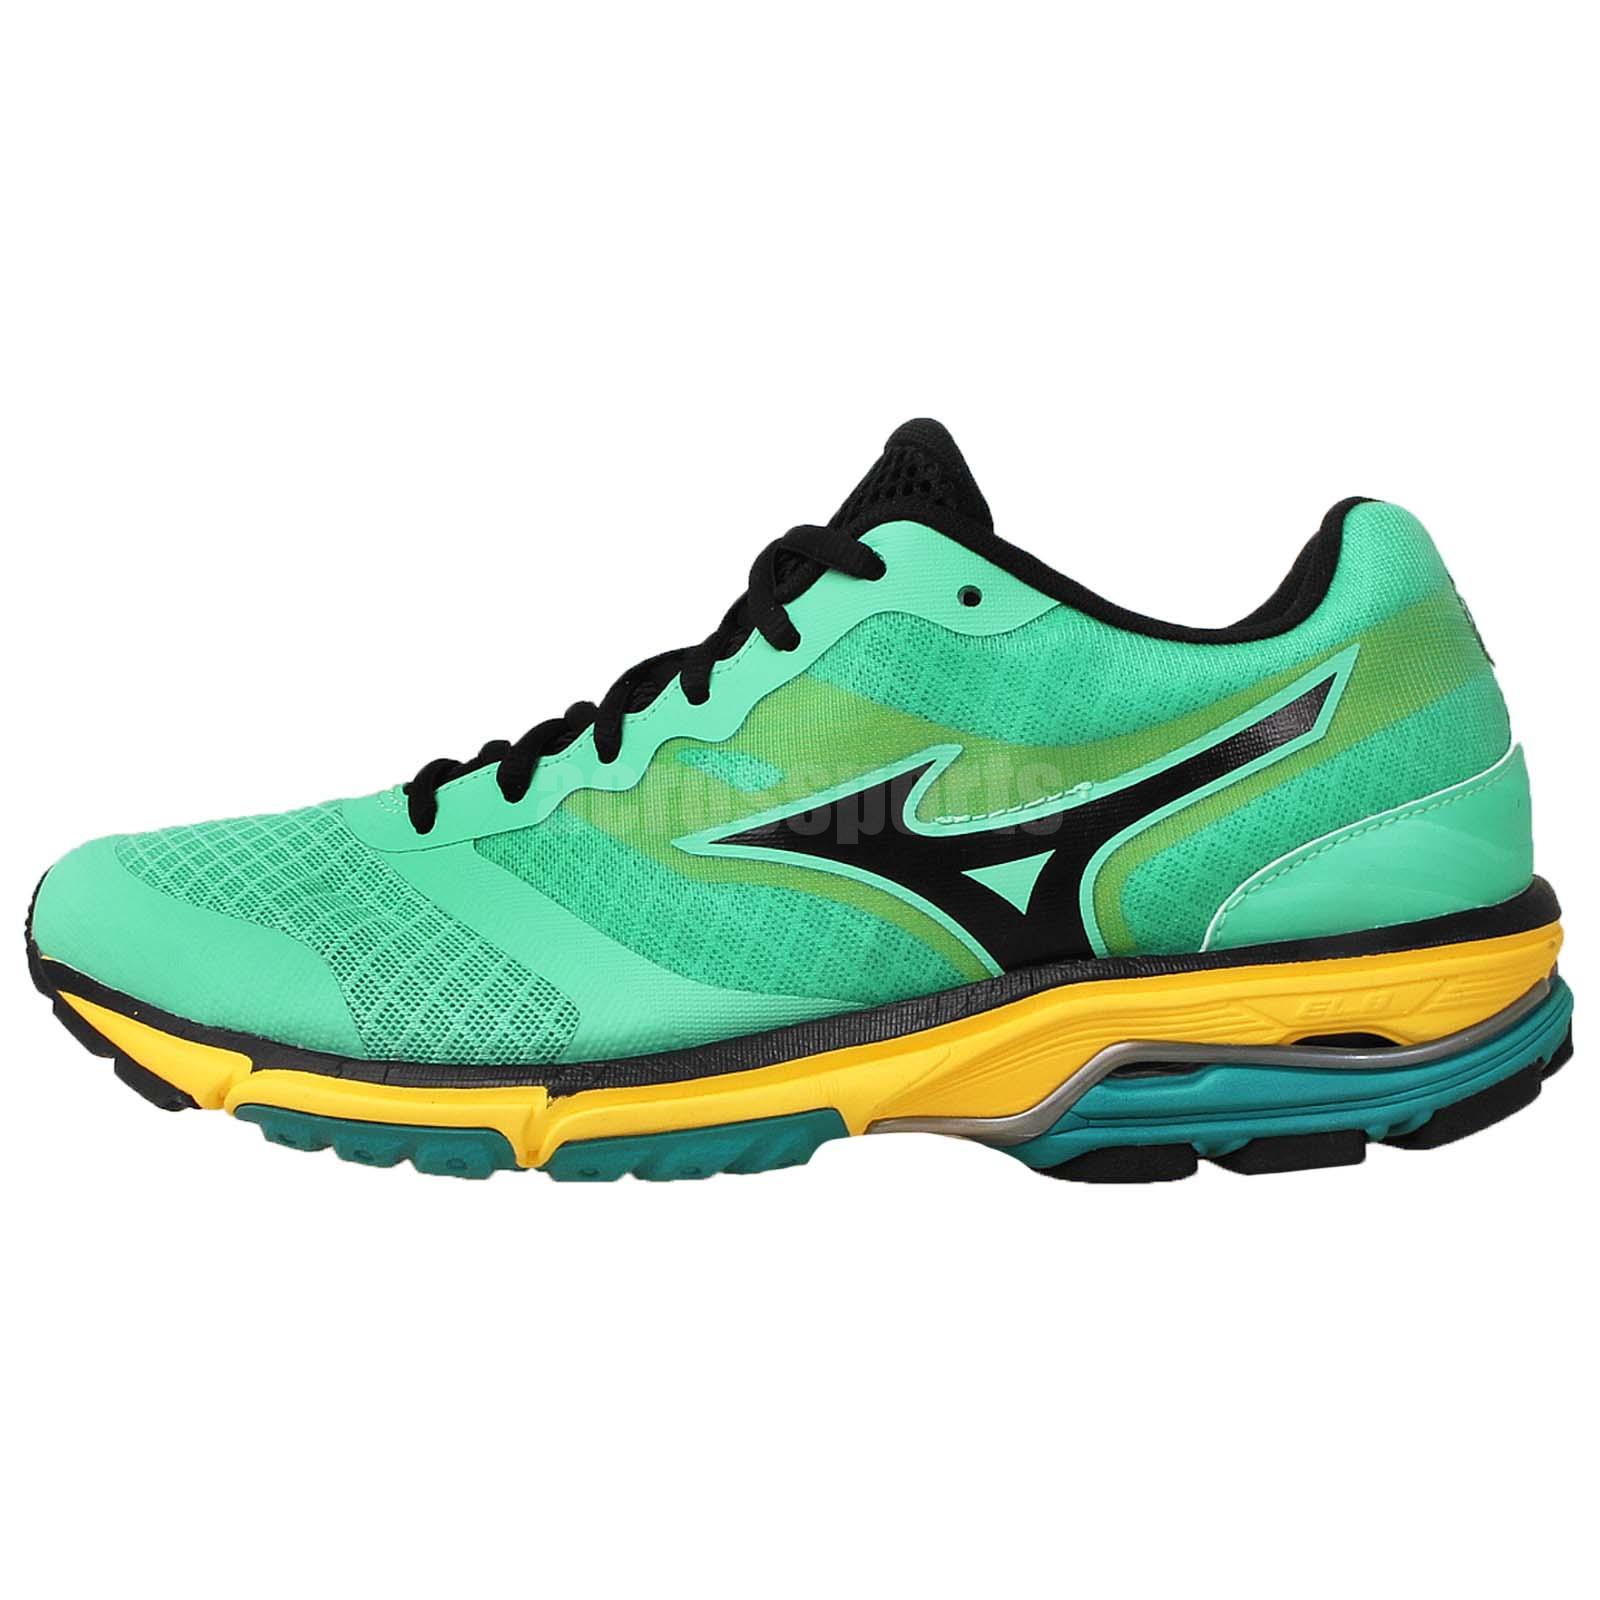 Mizuno Wave Unitus DC Green Yellow Mens Running Shoes